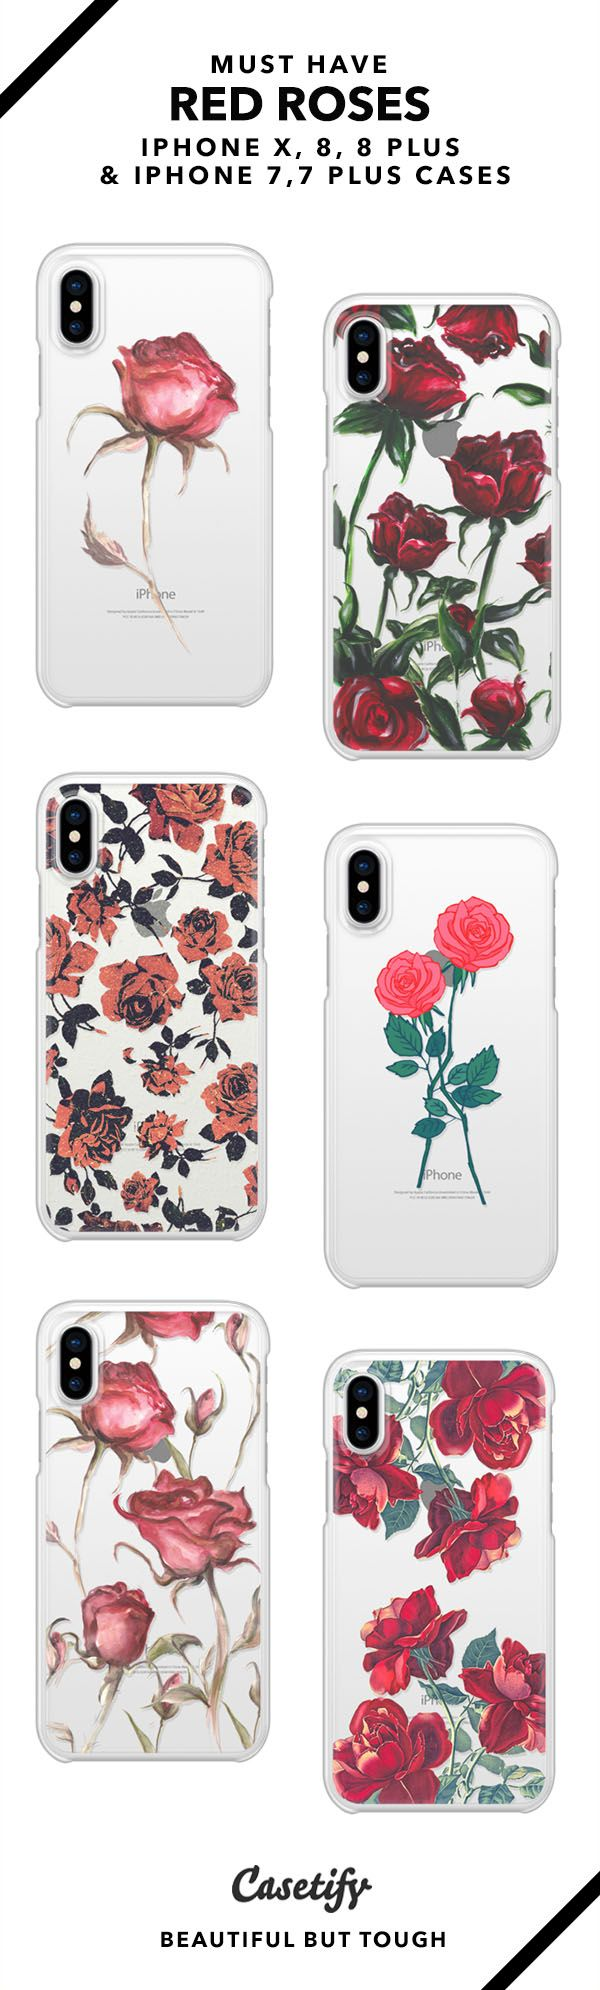 Must Have Red Roses Iphone 8 Iphone 8 Plus Iphone 7 Iphone 7 Plus